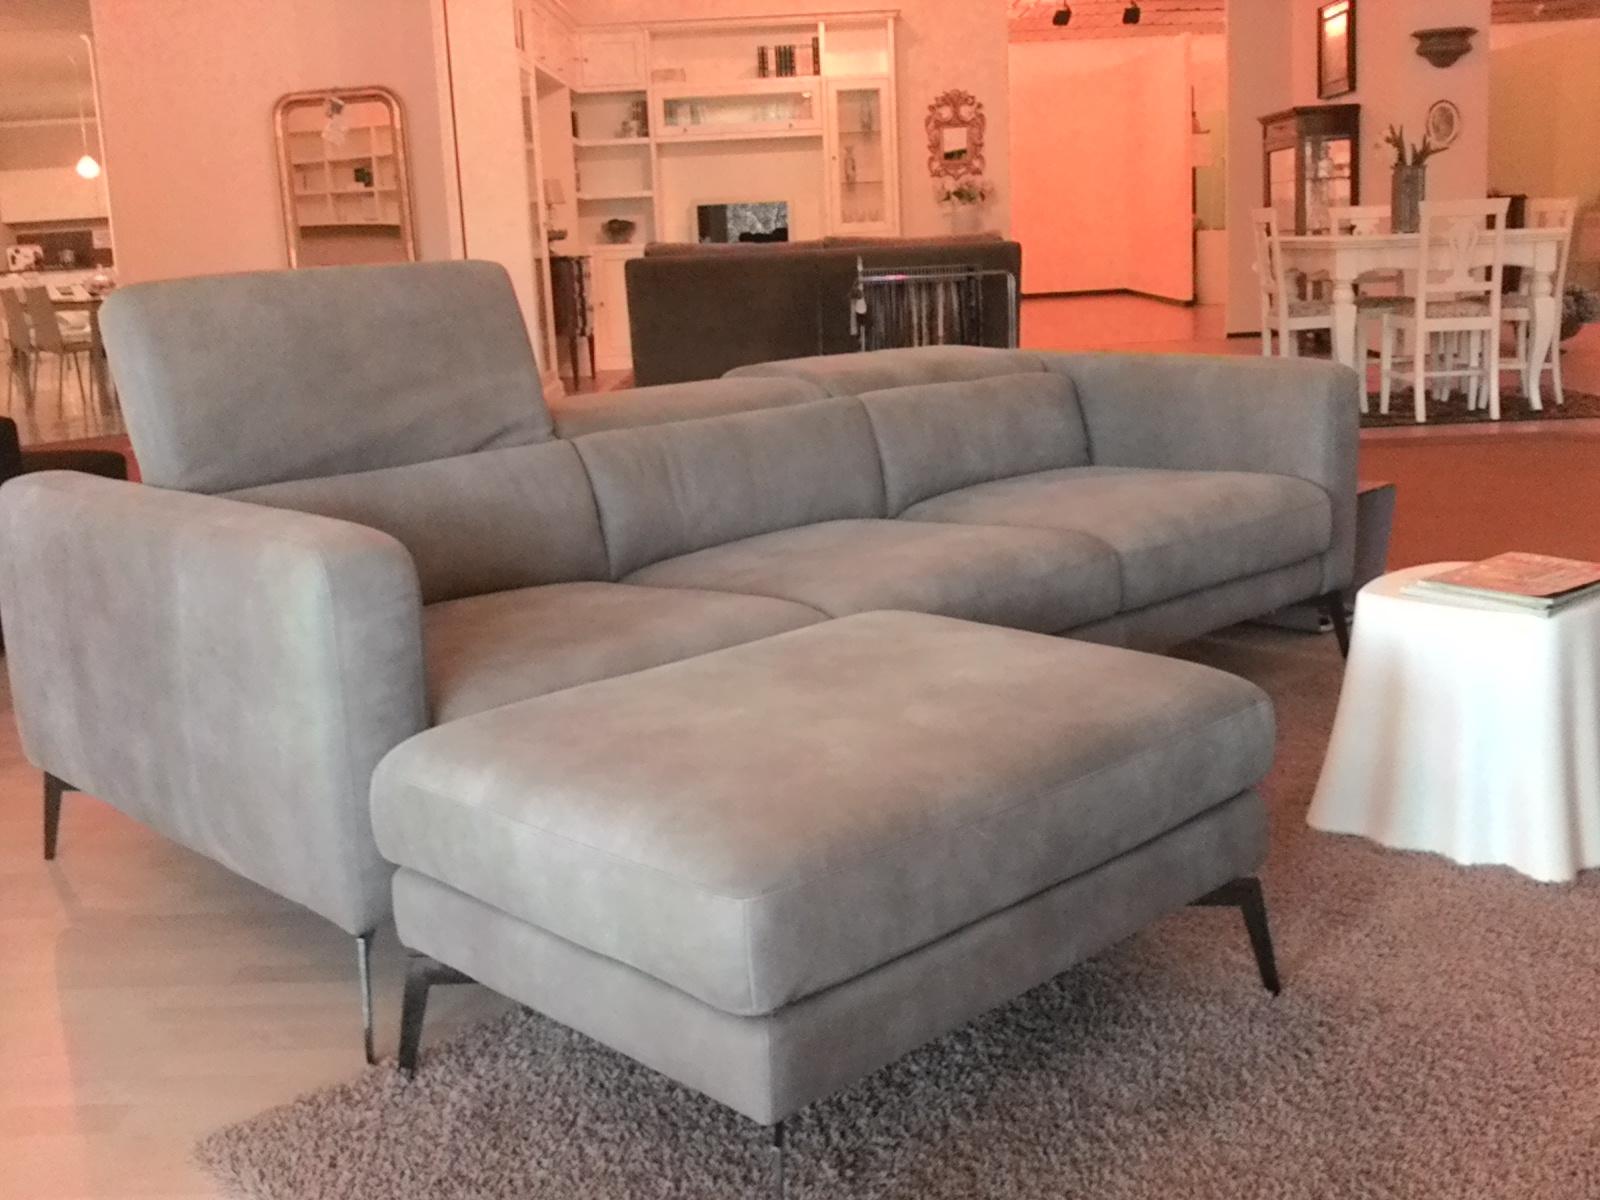 Rosini divano mantova divani lineari pelle divano 3 posti for Divano 4 posti